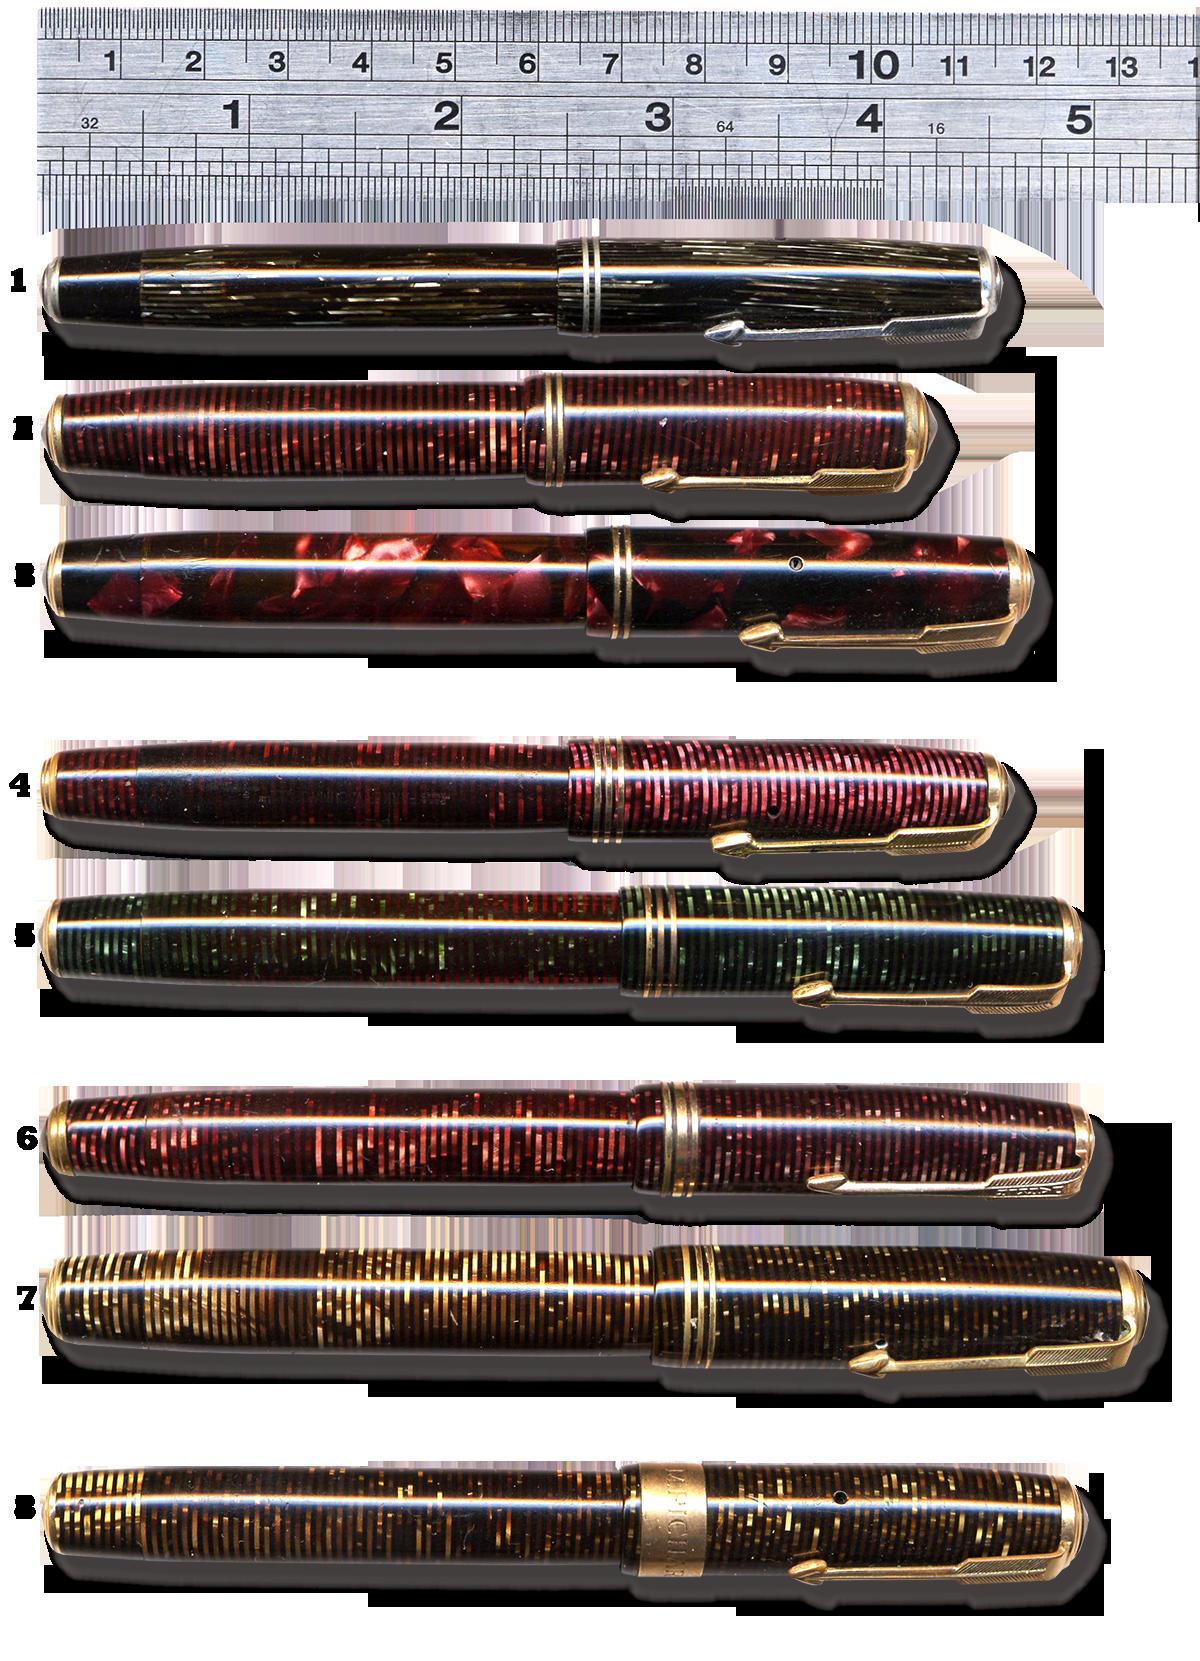 Parker Pens Penography Golden Arrow Vacuum Filler Vacumatic